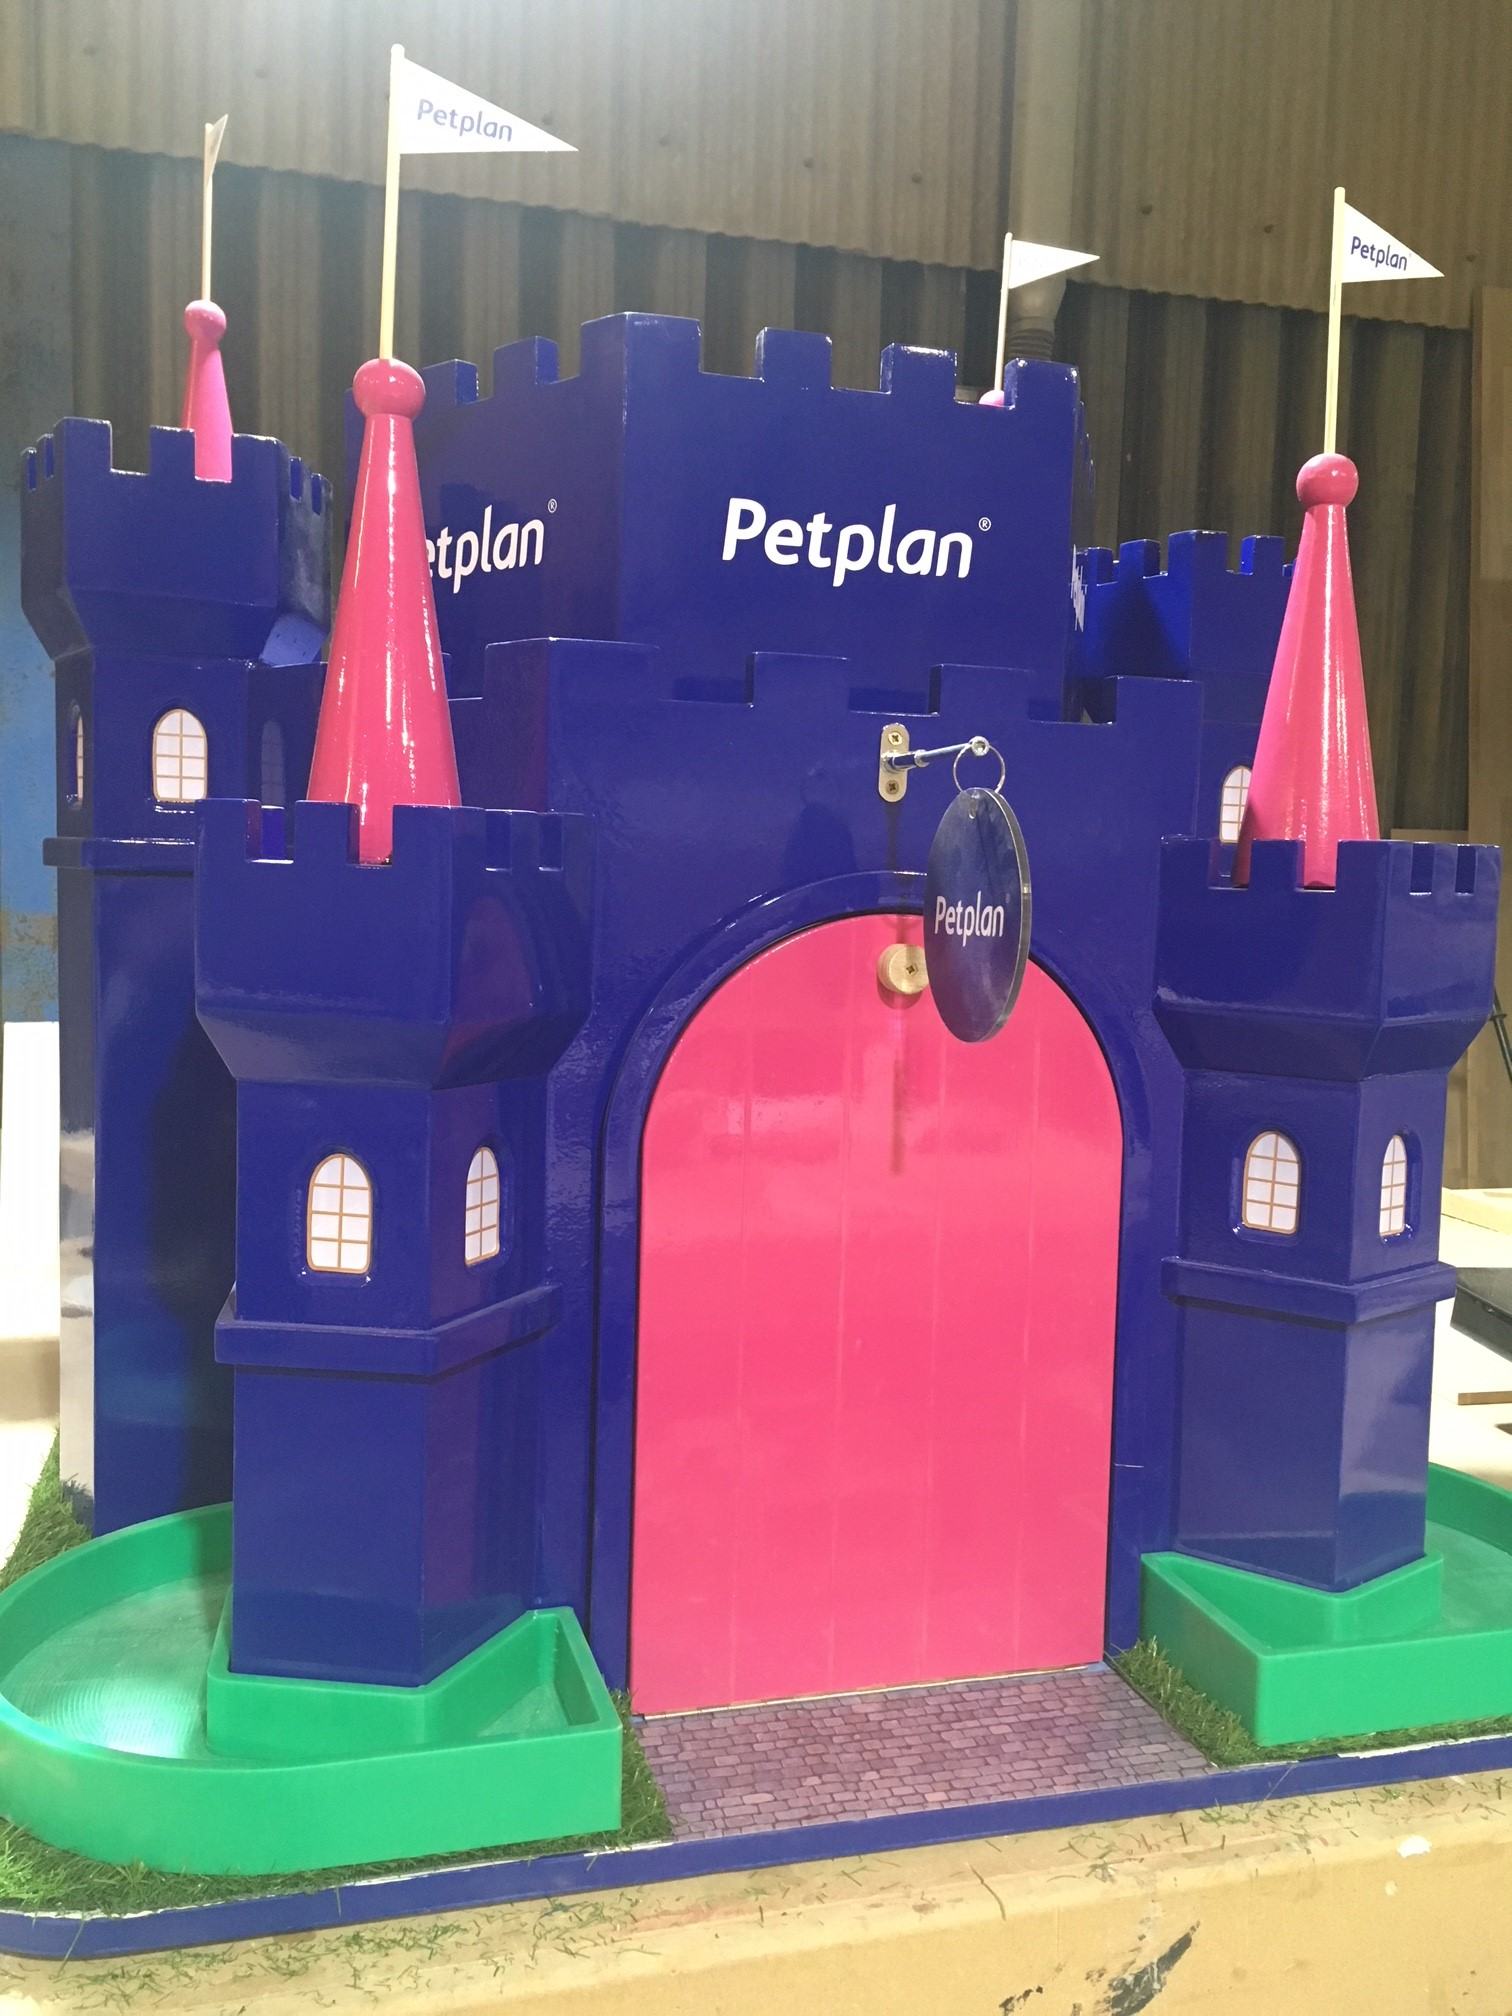 Petplan - Laura D'Alessandro of Henson Franklin - Barkingham Palace - Image 5 of 6